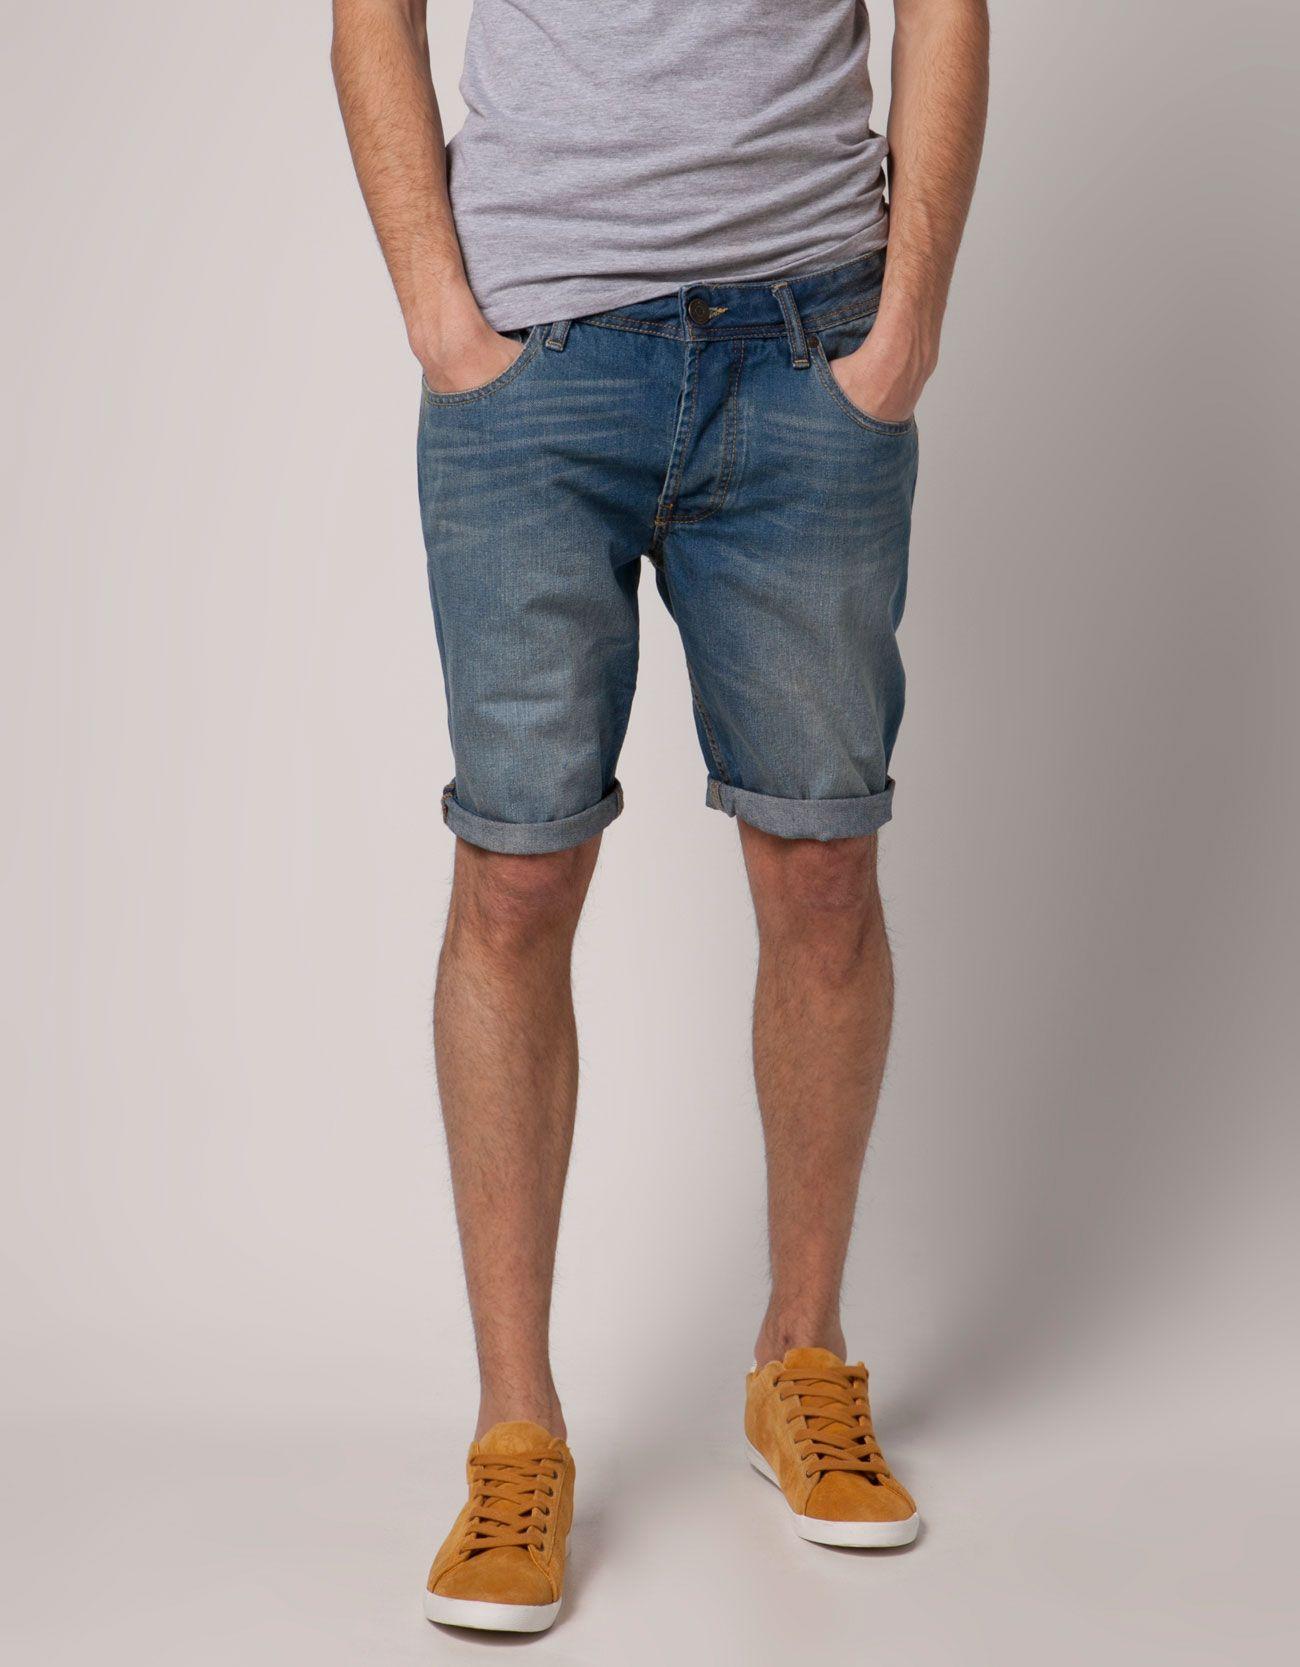 b0f6e20475  19.99 Bermuda jeans (arrechisima)